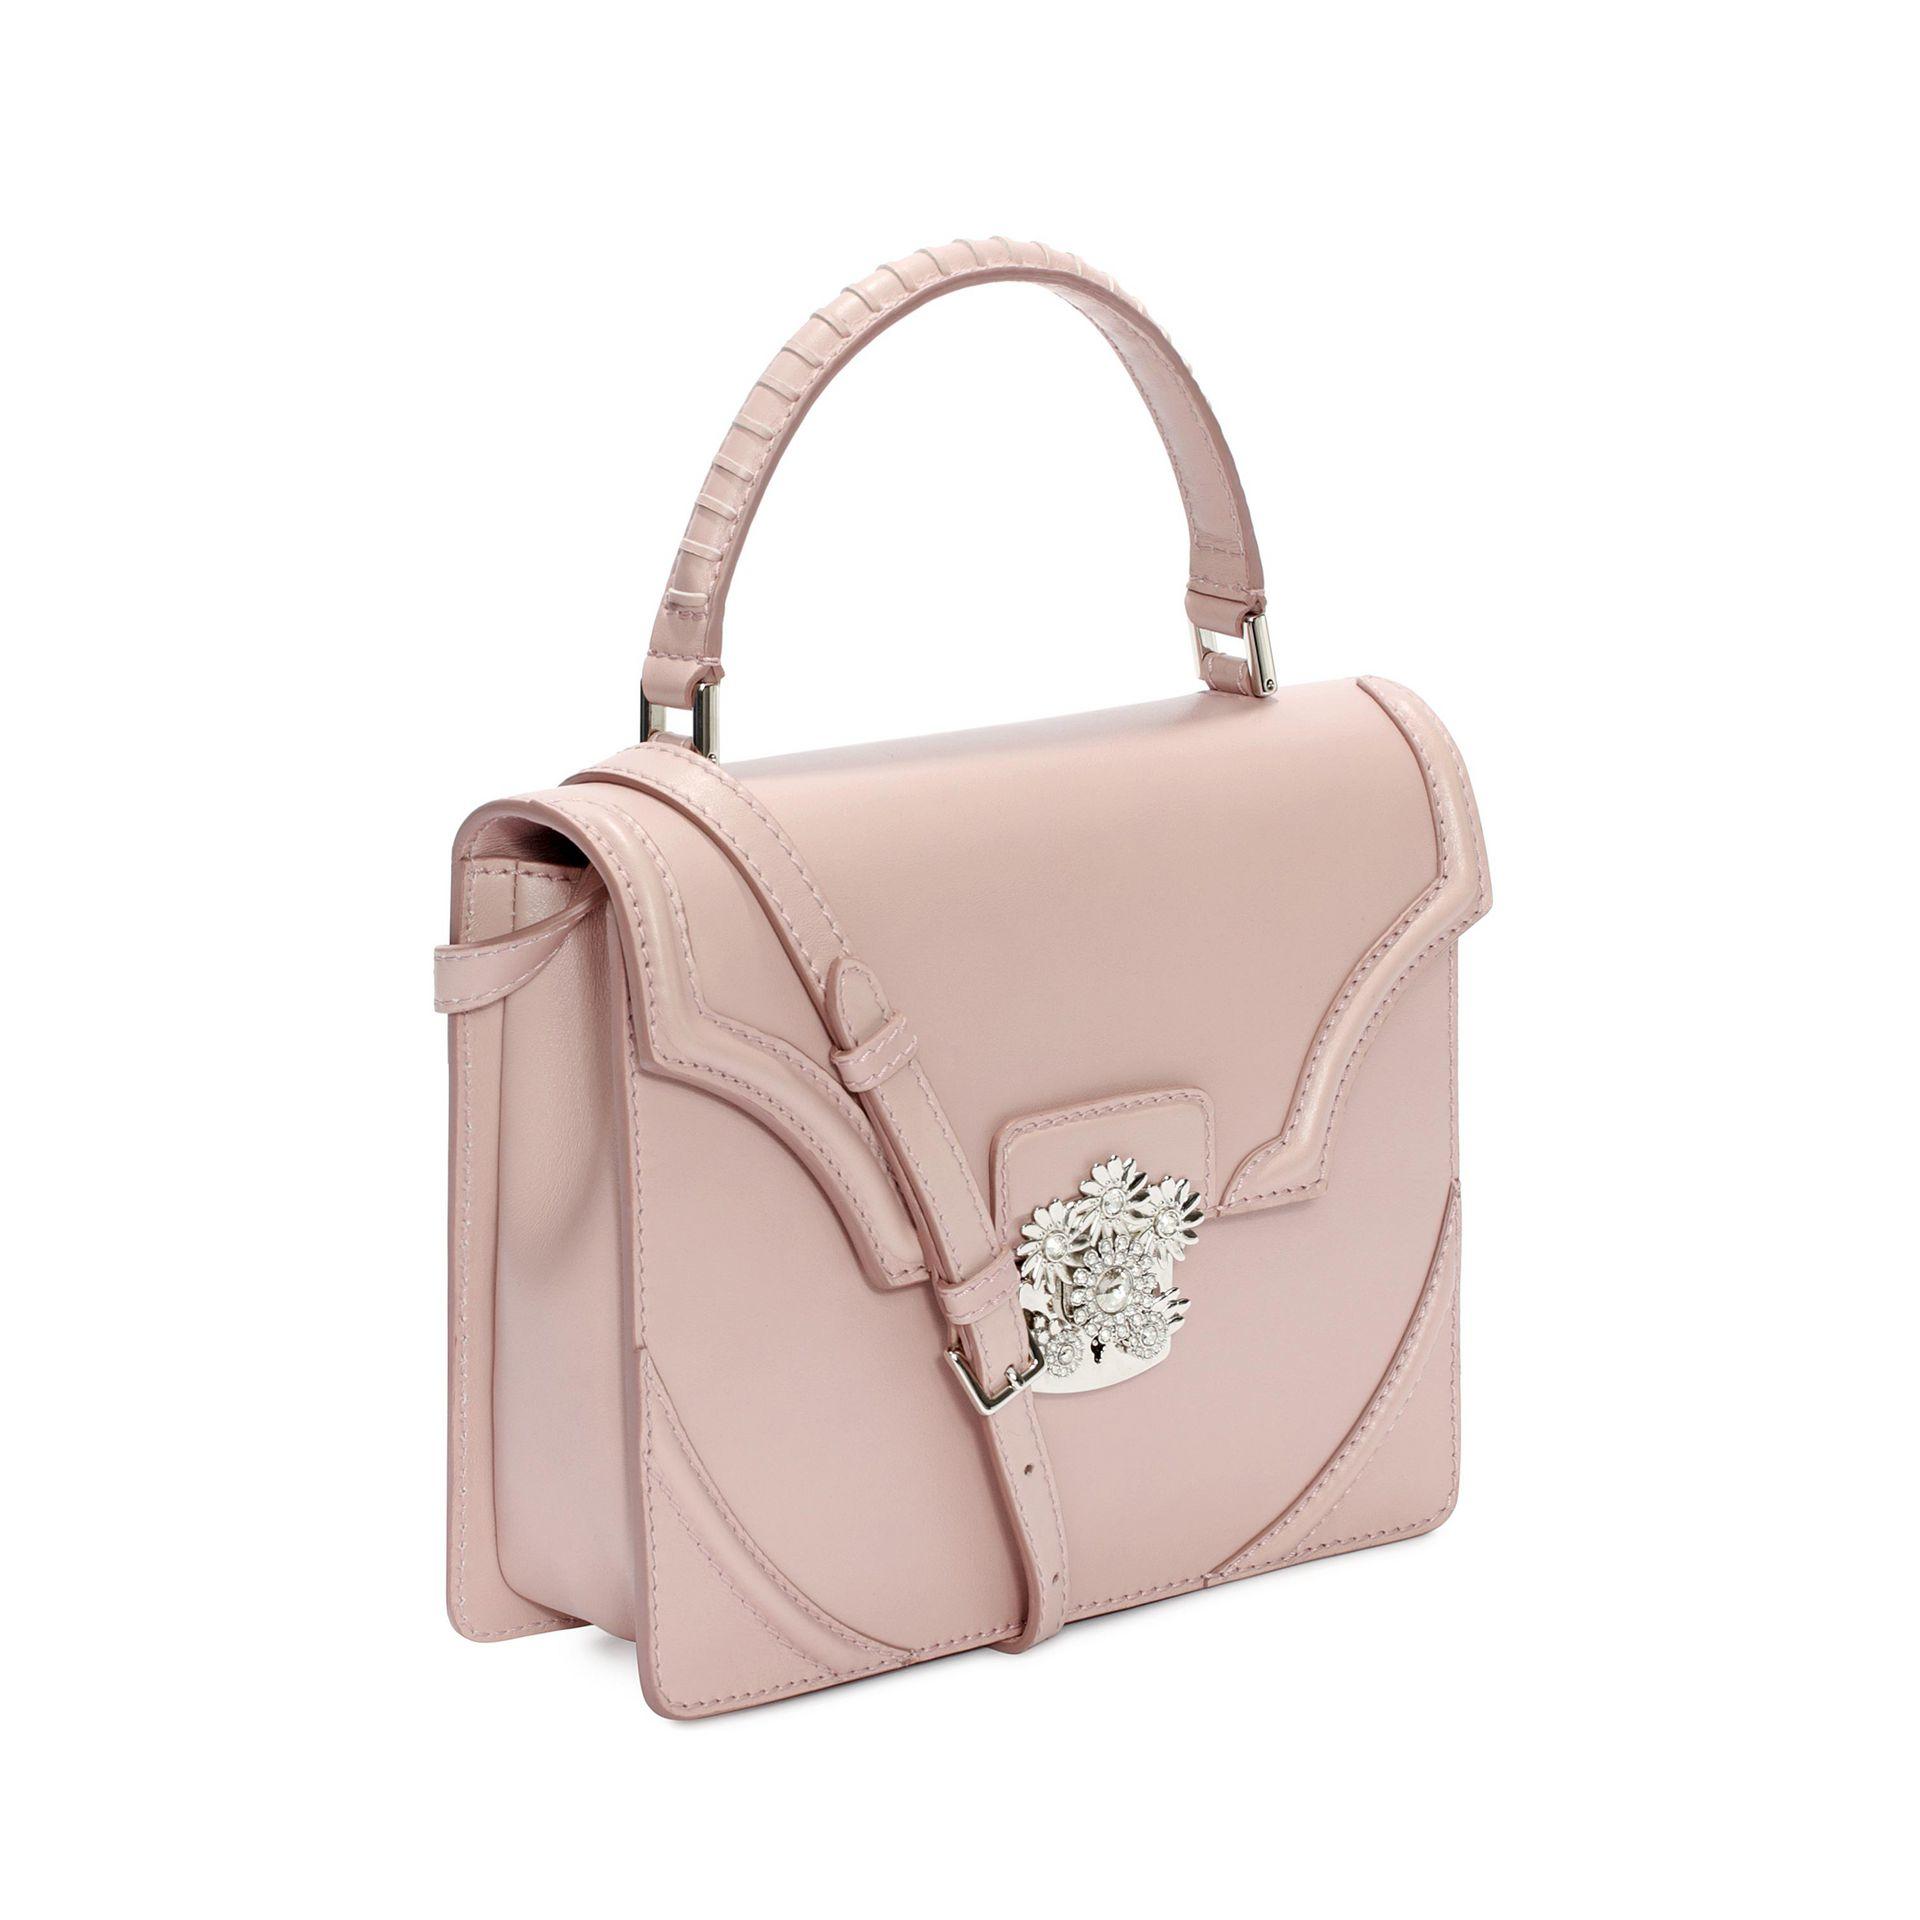 Lyst Alexander Mcqueen Calf Leather Flower Satchel In Pink